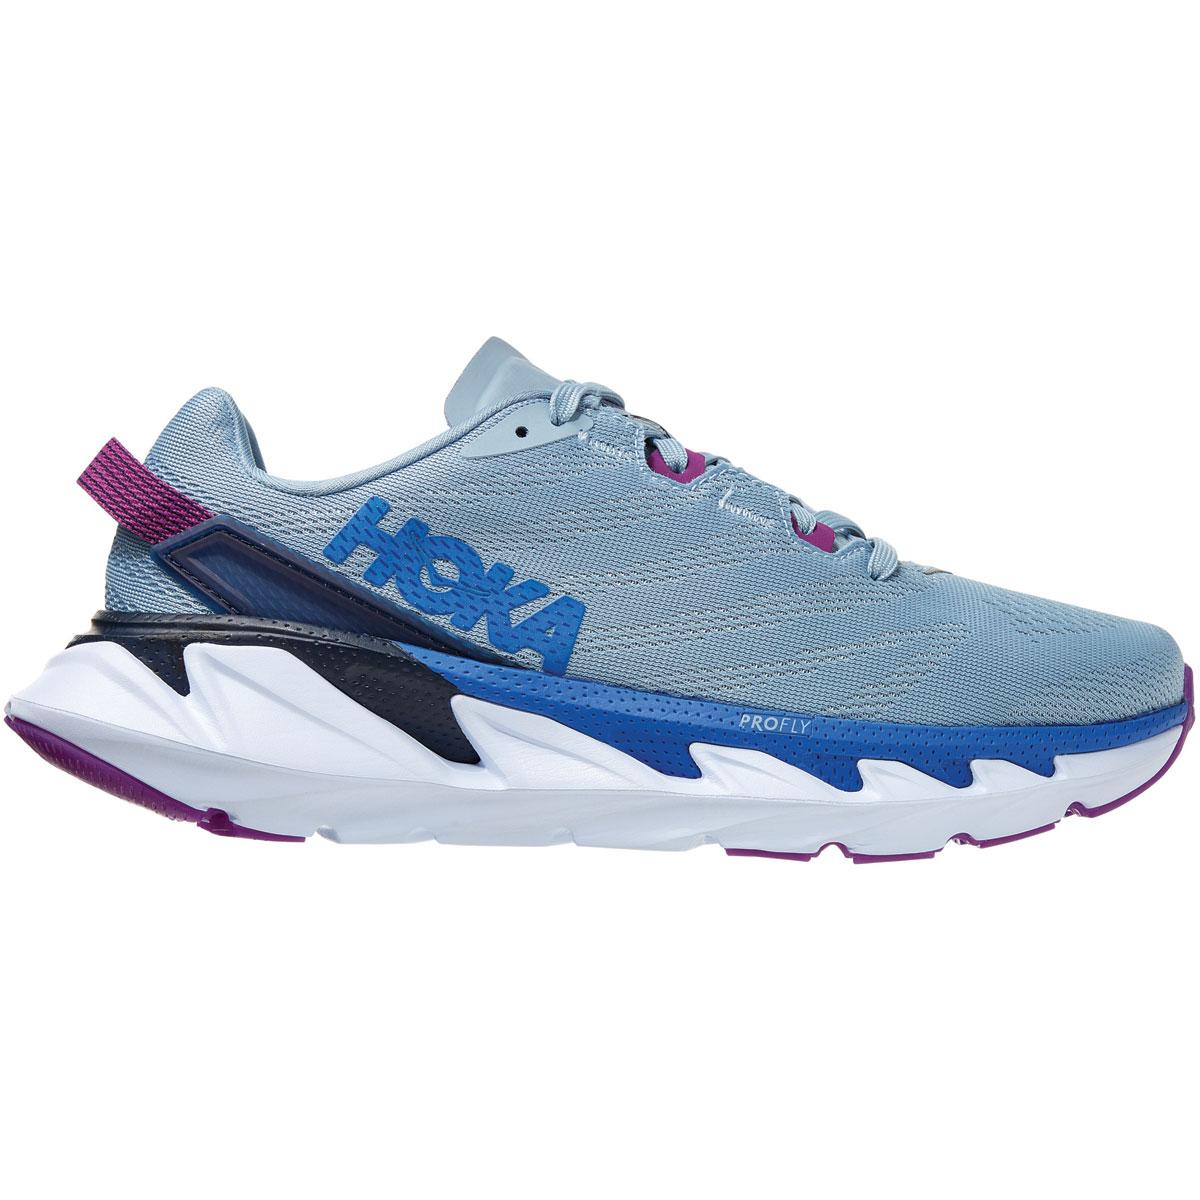 Women's Hoka One One Elevon 2 Running Shoe - Color: Ballad Blue - Size: 5 - Width: Regular, Ballad Blue, large, image 1